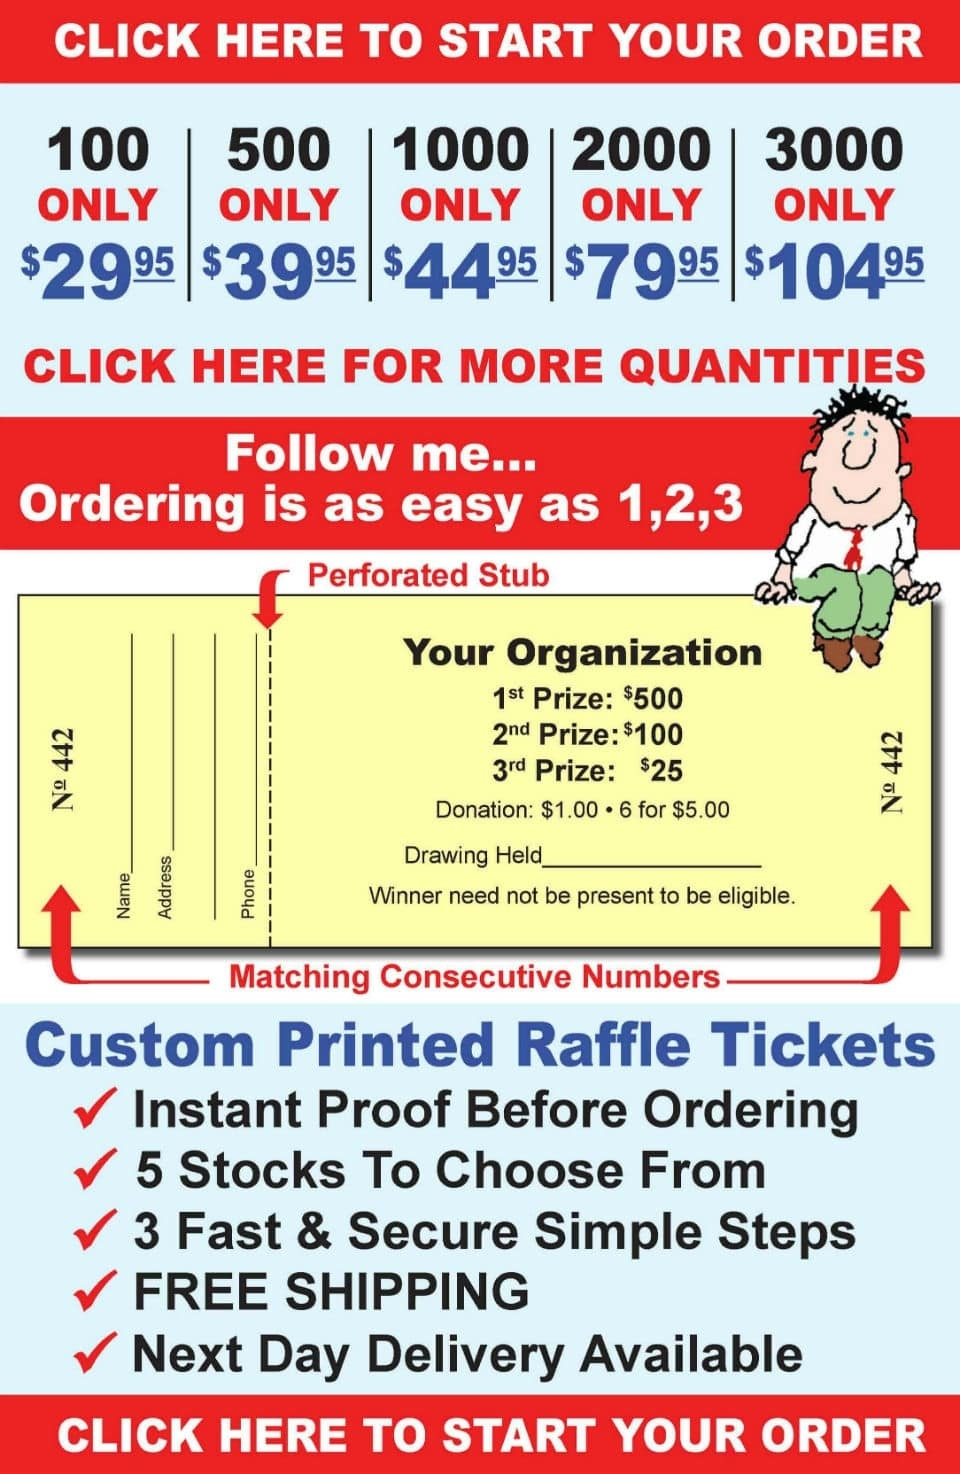 Custom Raffle Tickets Are Our Specialty | Raffleticket